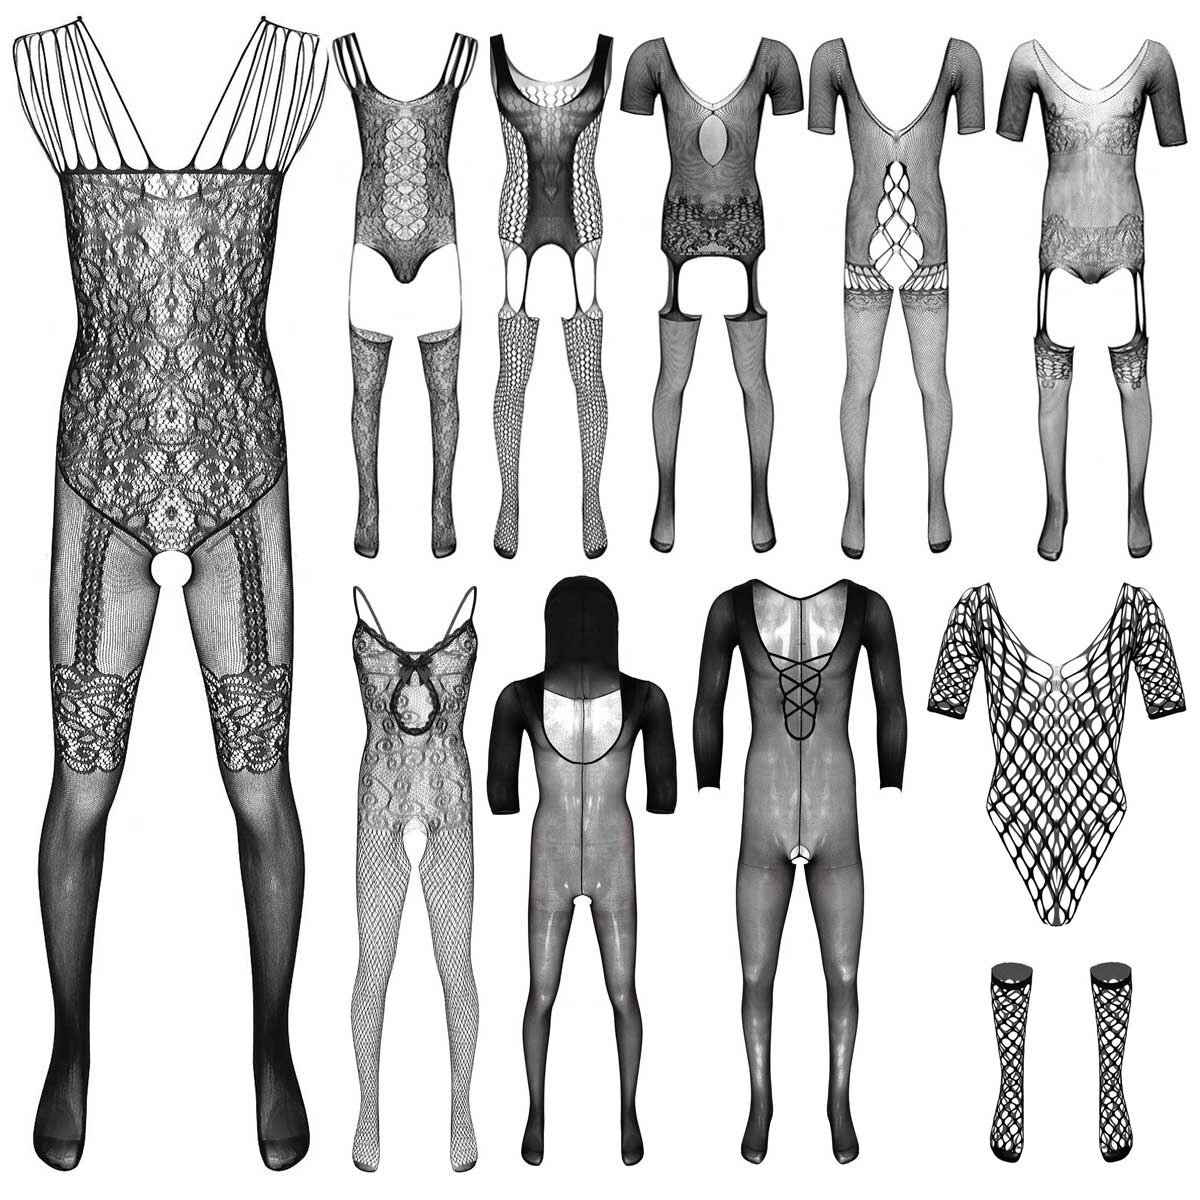 Ropa interior erótica para hombre, ropa de dormir transparente, malla transparente, Body de rejilla, pantimedias elásticas, medias sexis para hombre